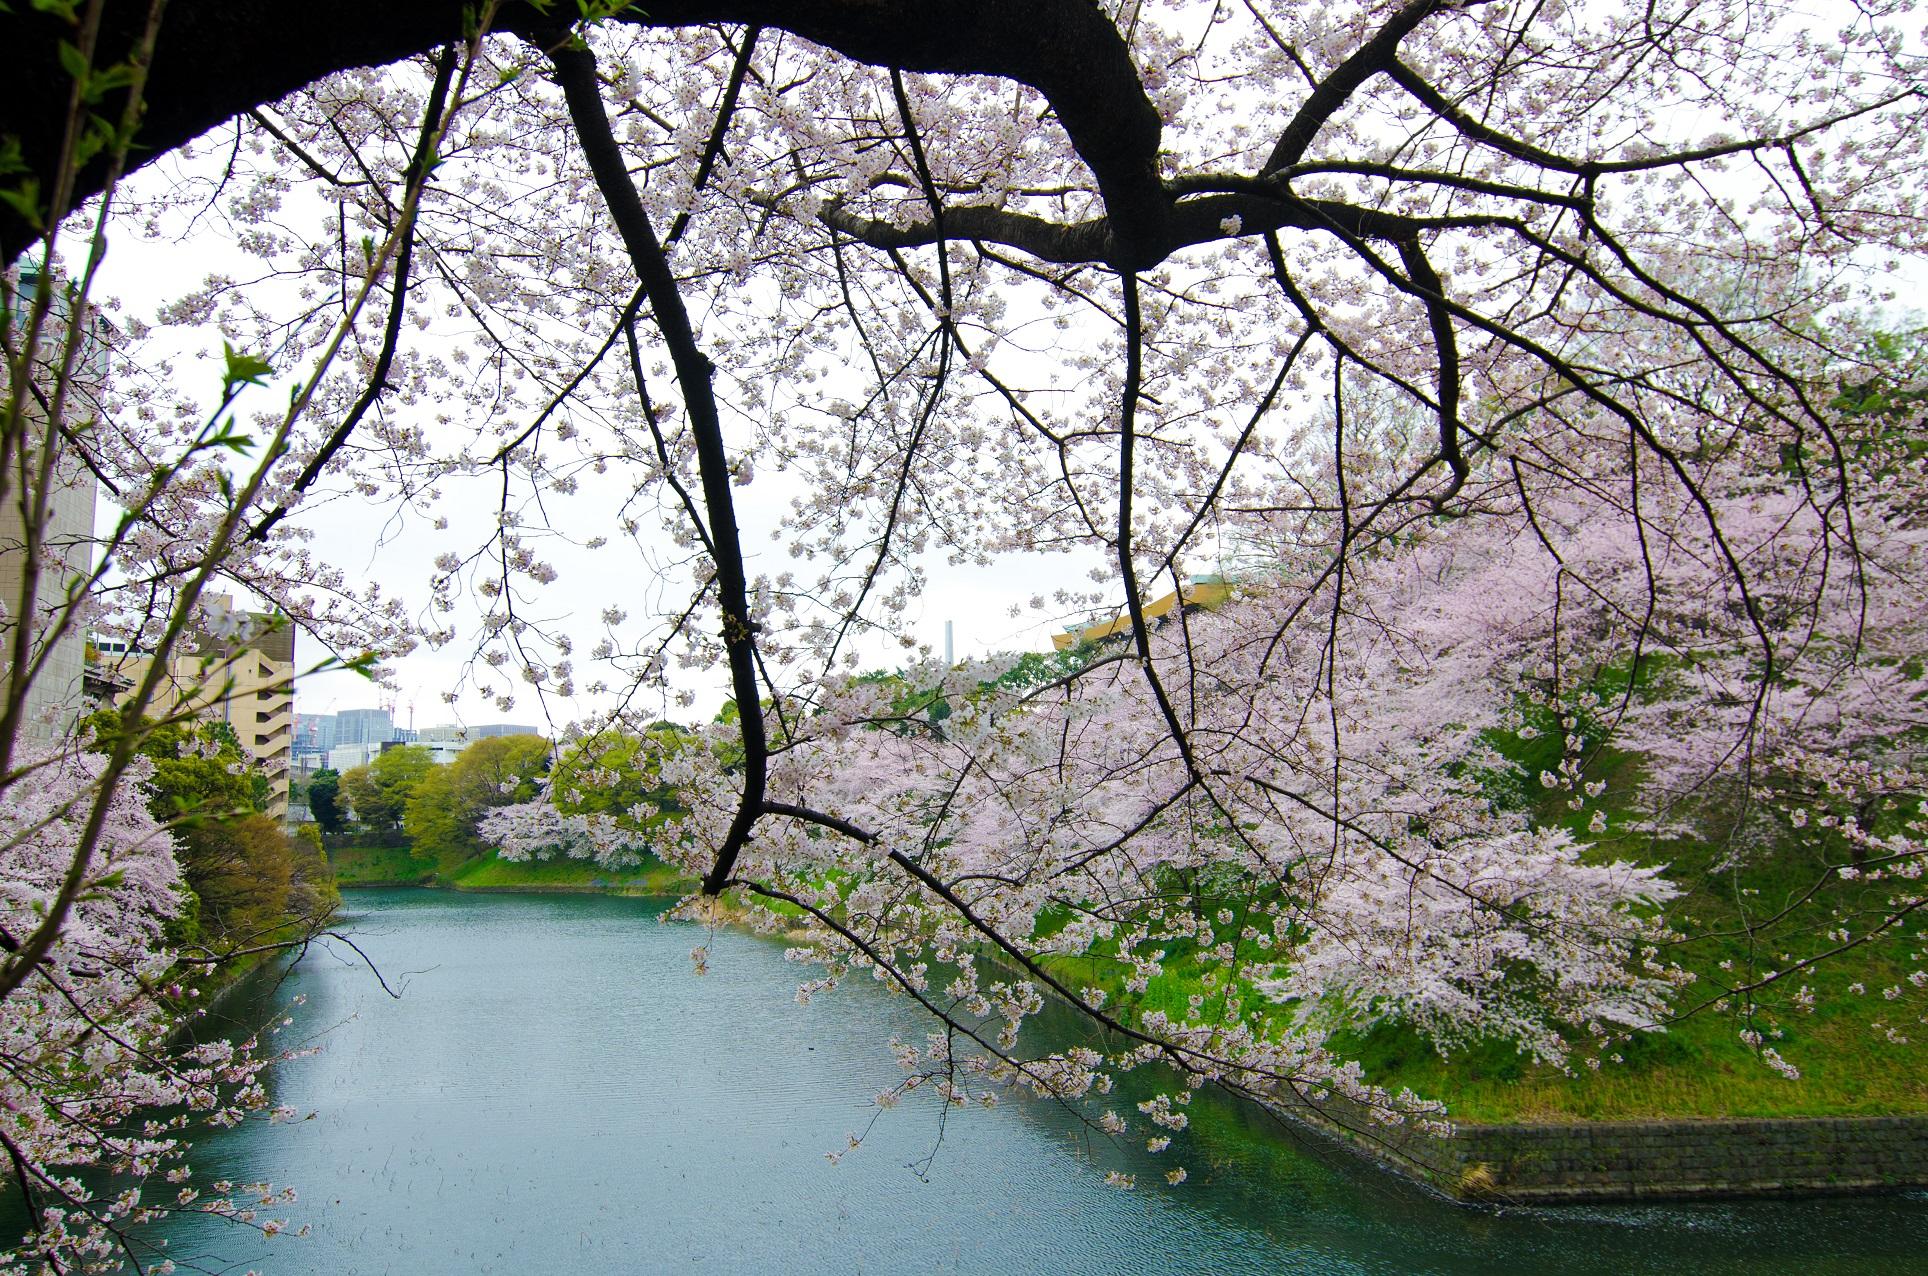 Hanami (by Paul Robinson, CC BY 2.0 - https://www.flickr.com/photos/paulrobinson/5672252247/ )